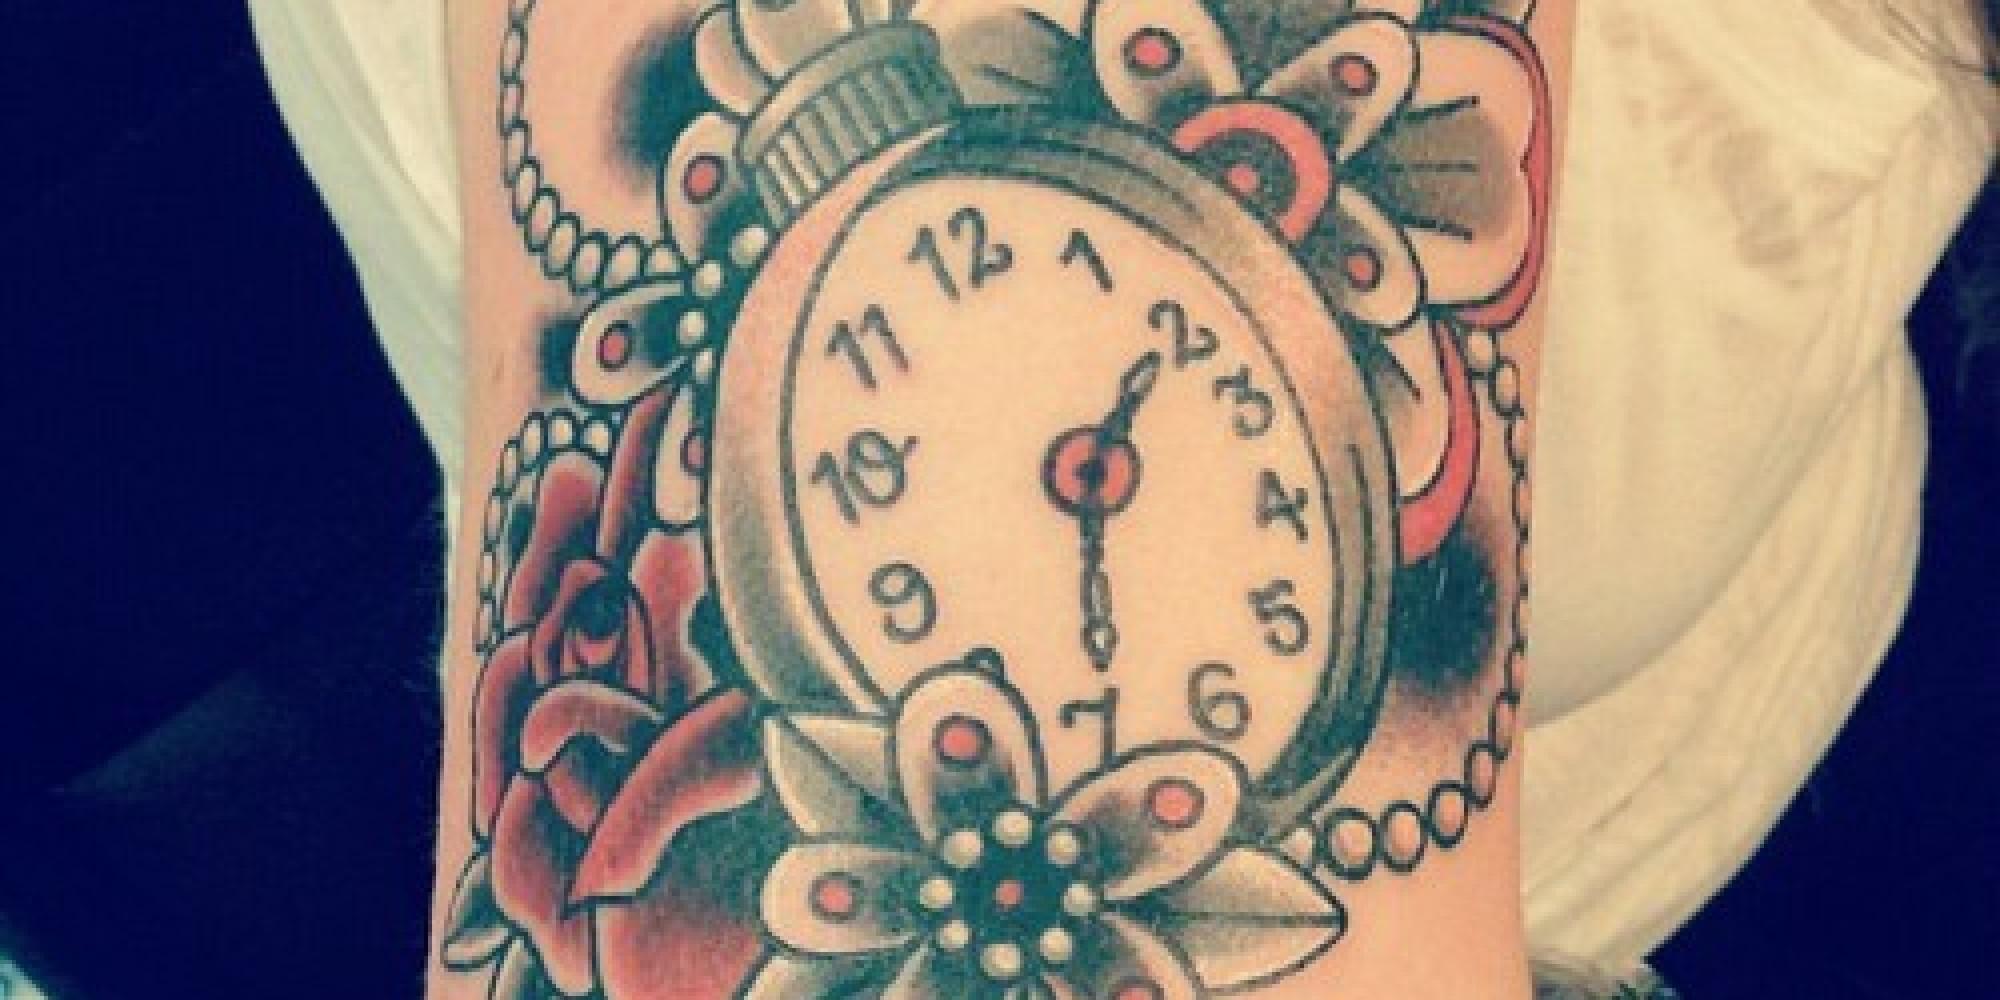 Tatuaggi gli orologi da taschino spopolano e gli orologi for Bussola tattoo significato